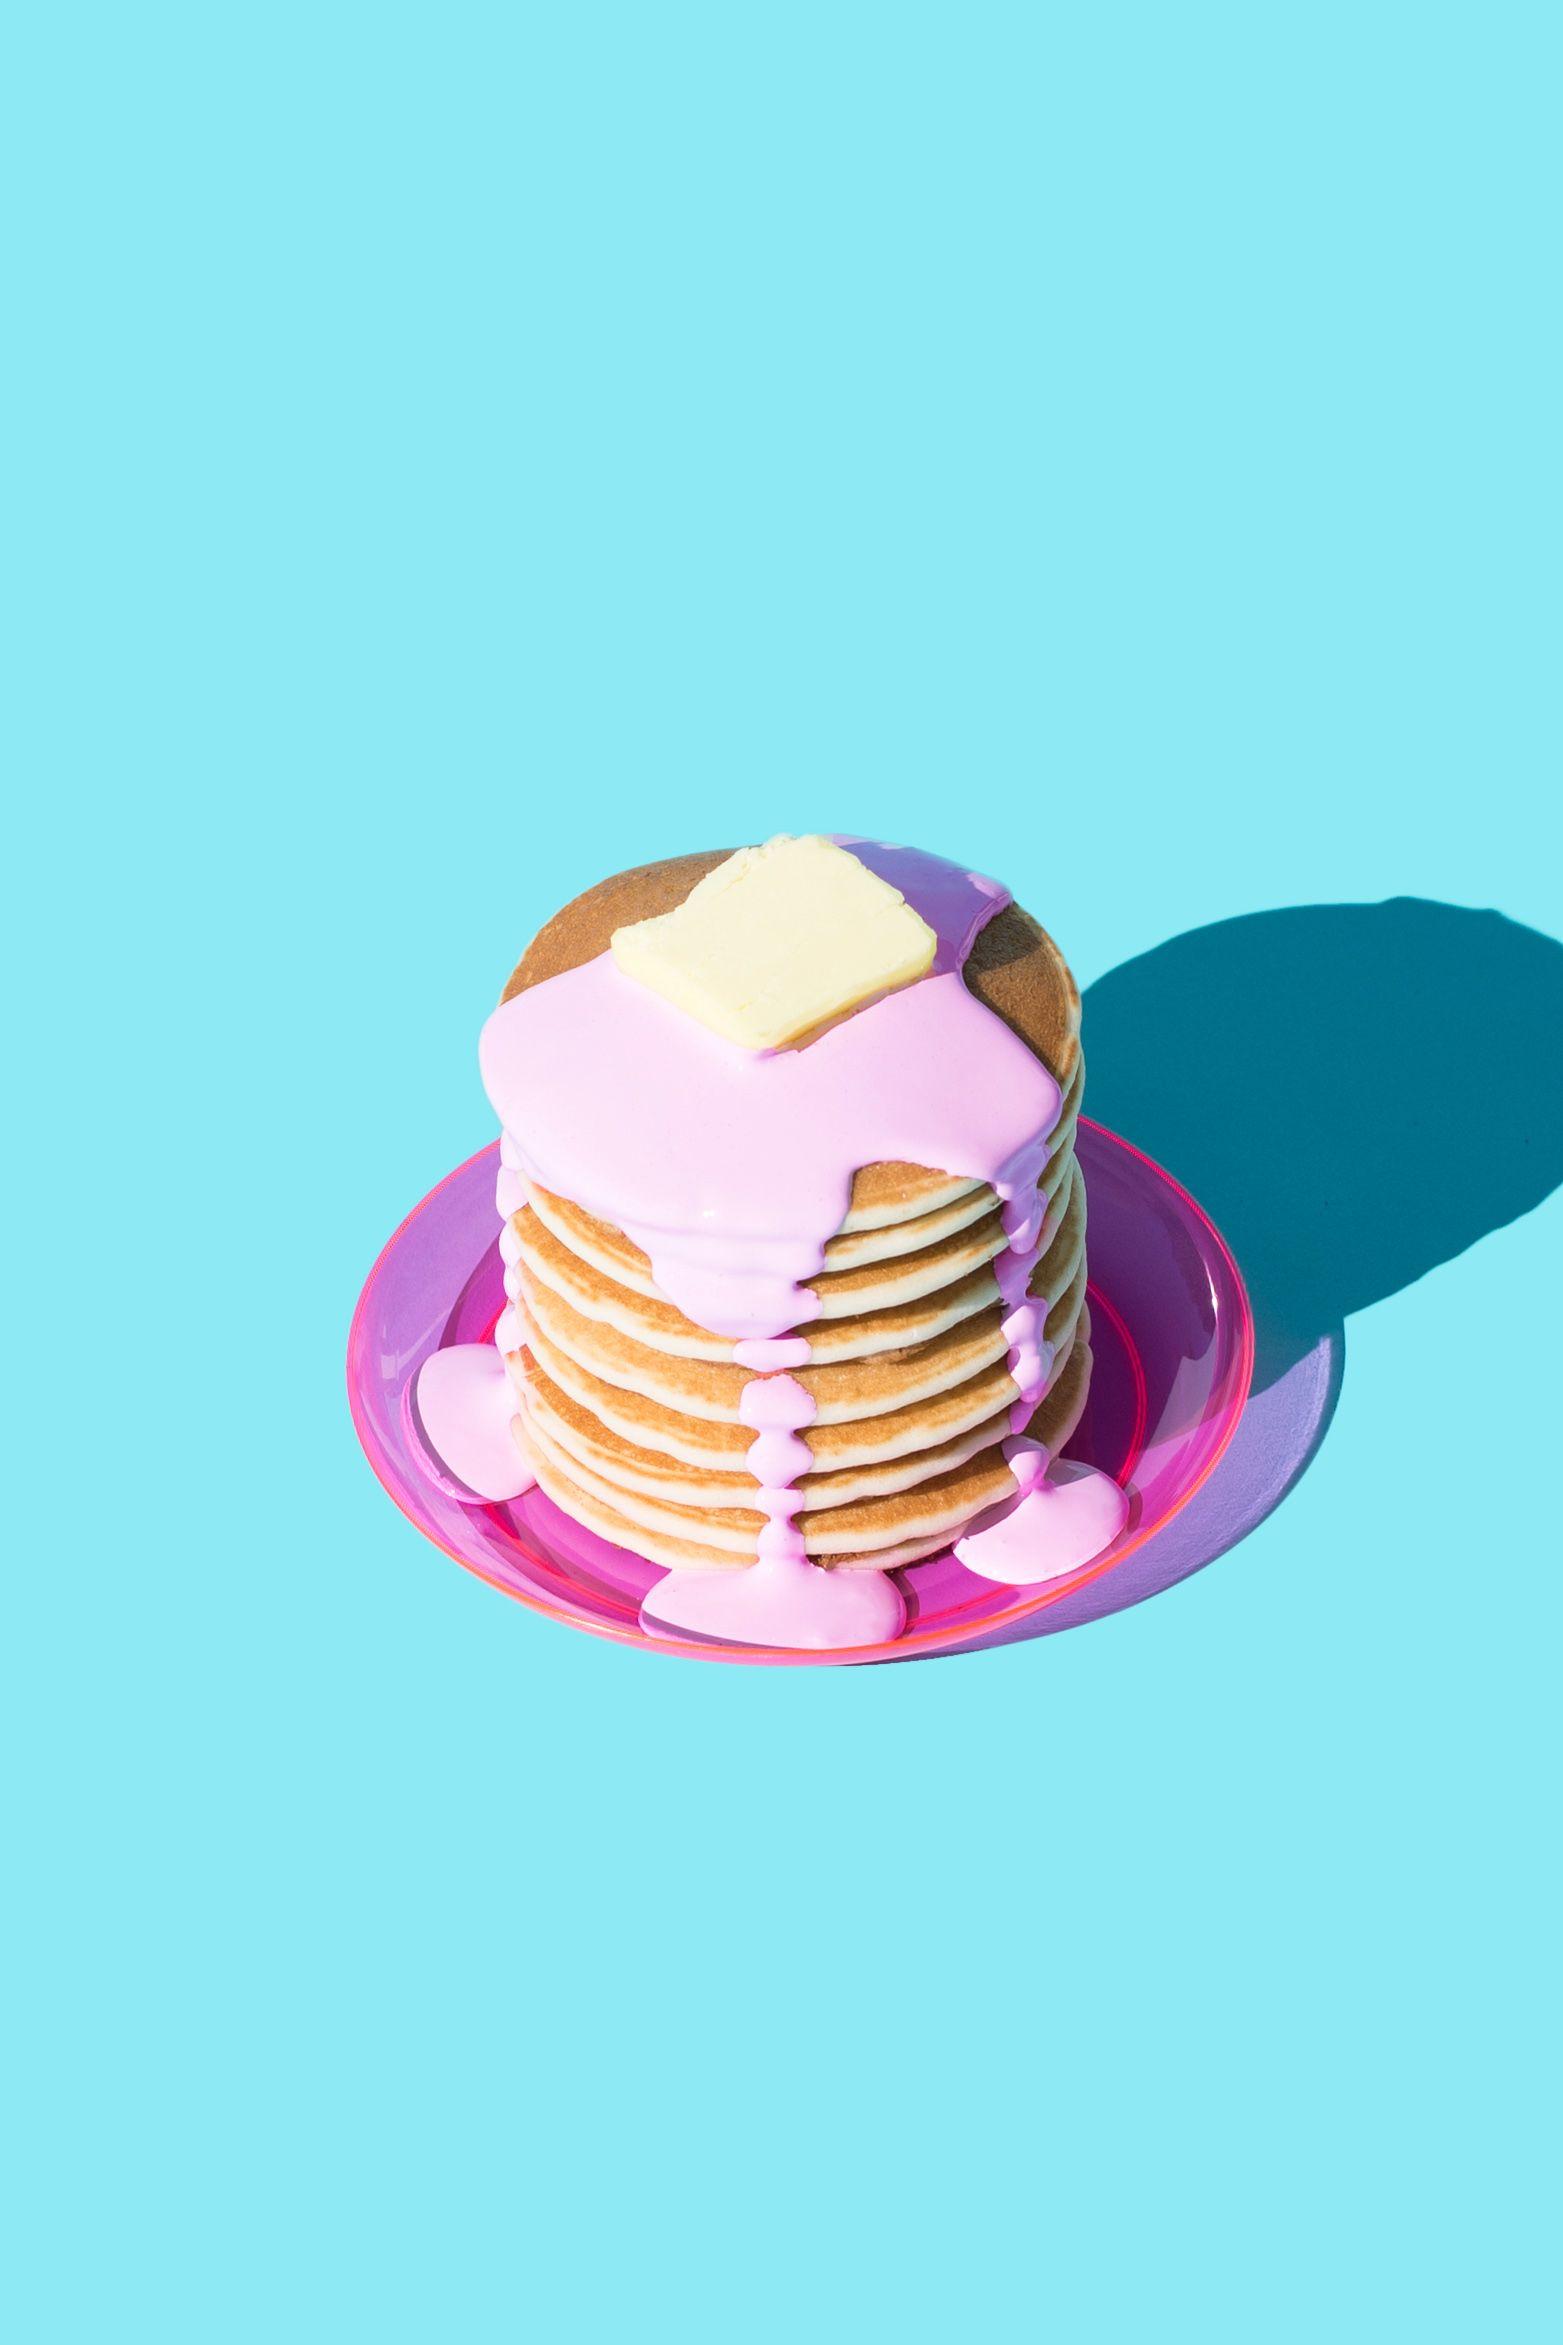 Colorful Food Wallpaper Free Download: Pancakes In Pink / Violet Tinder Studios